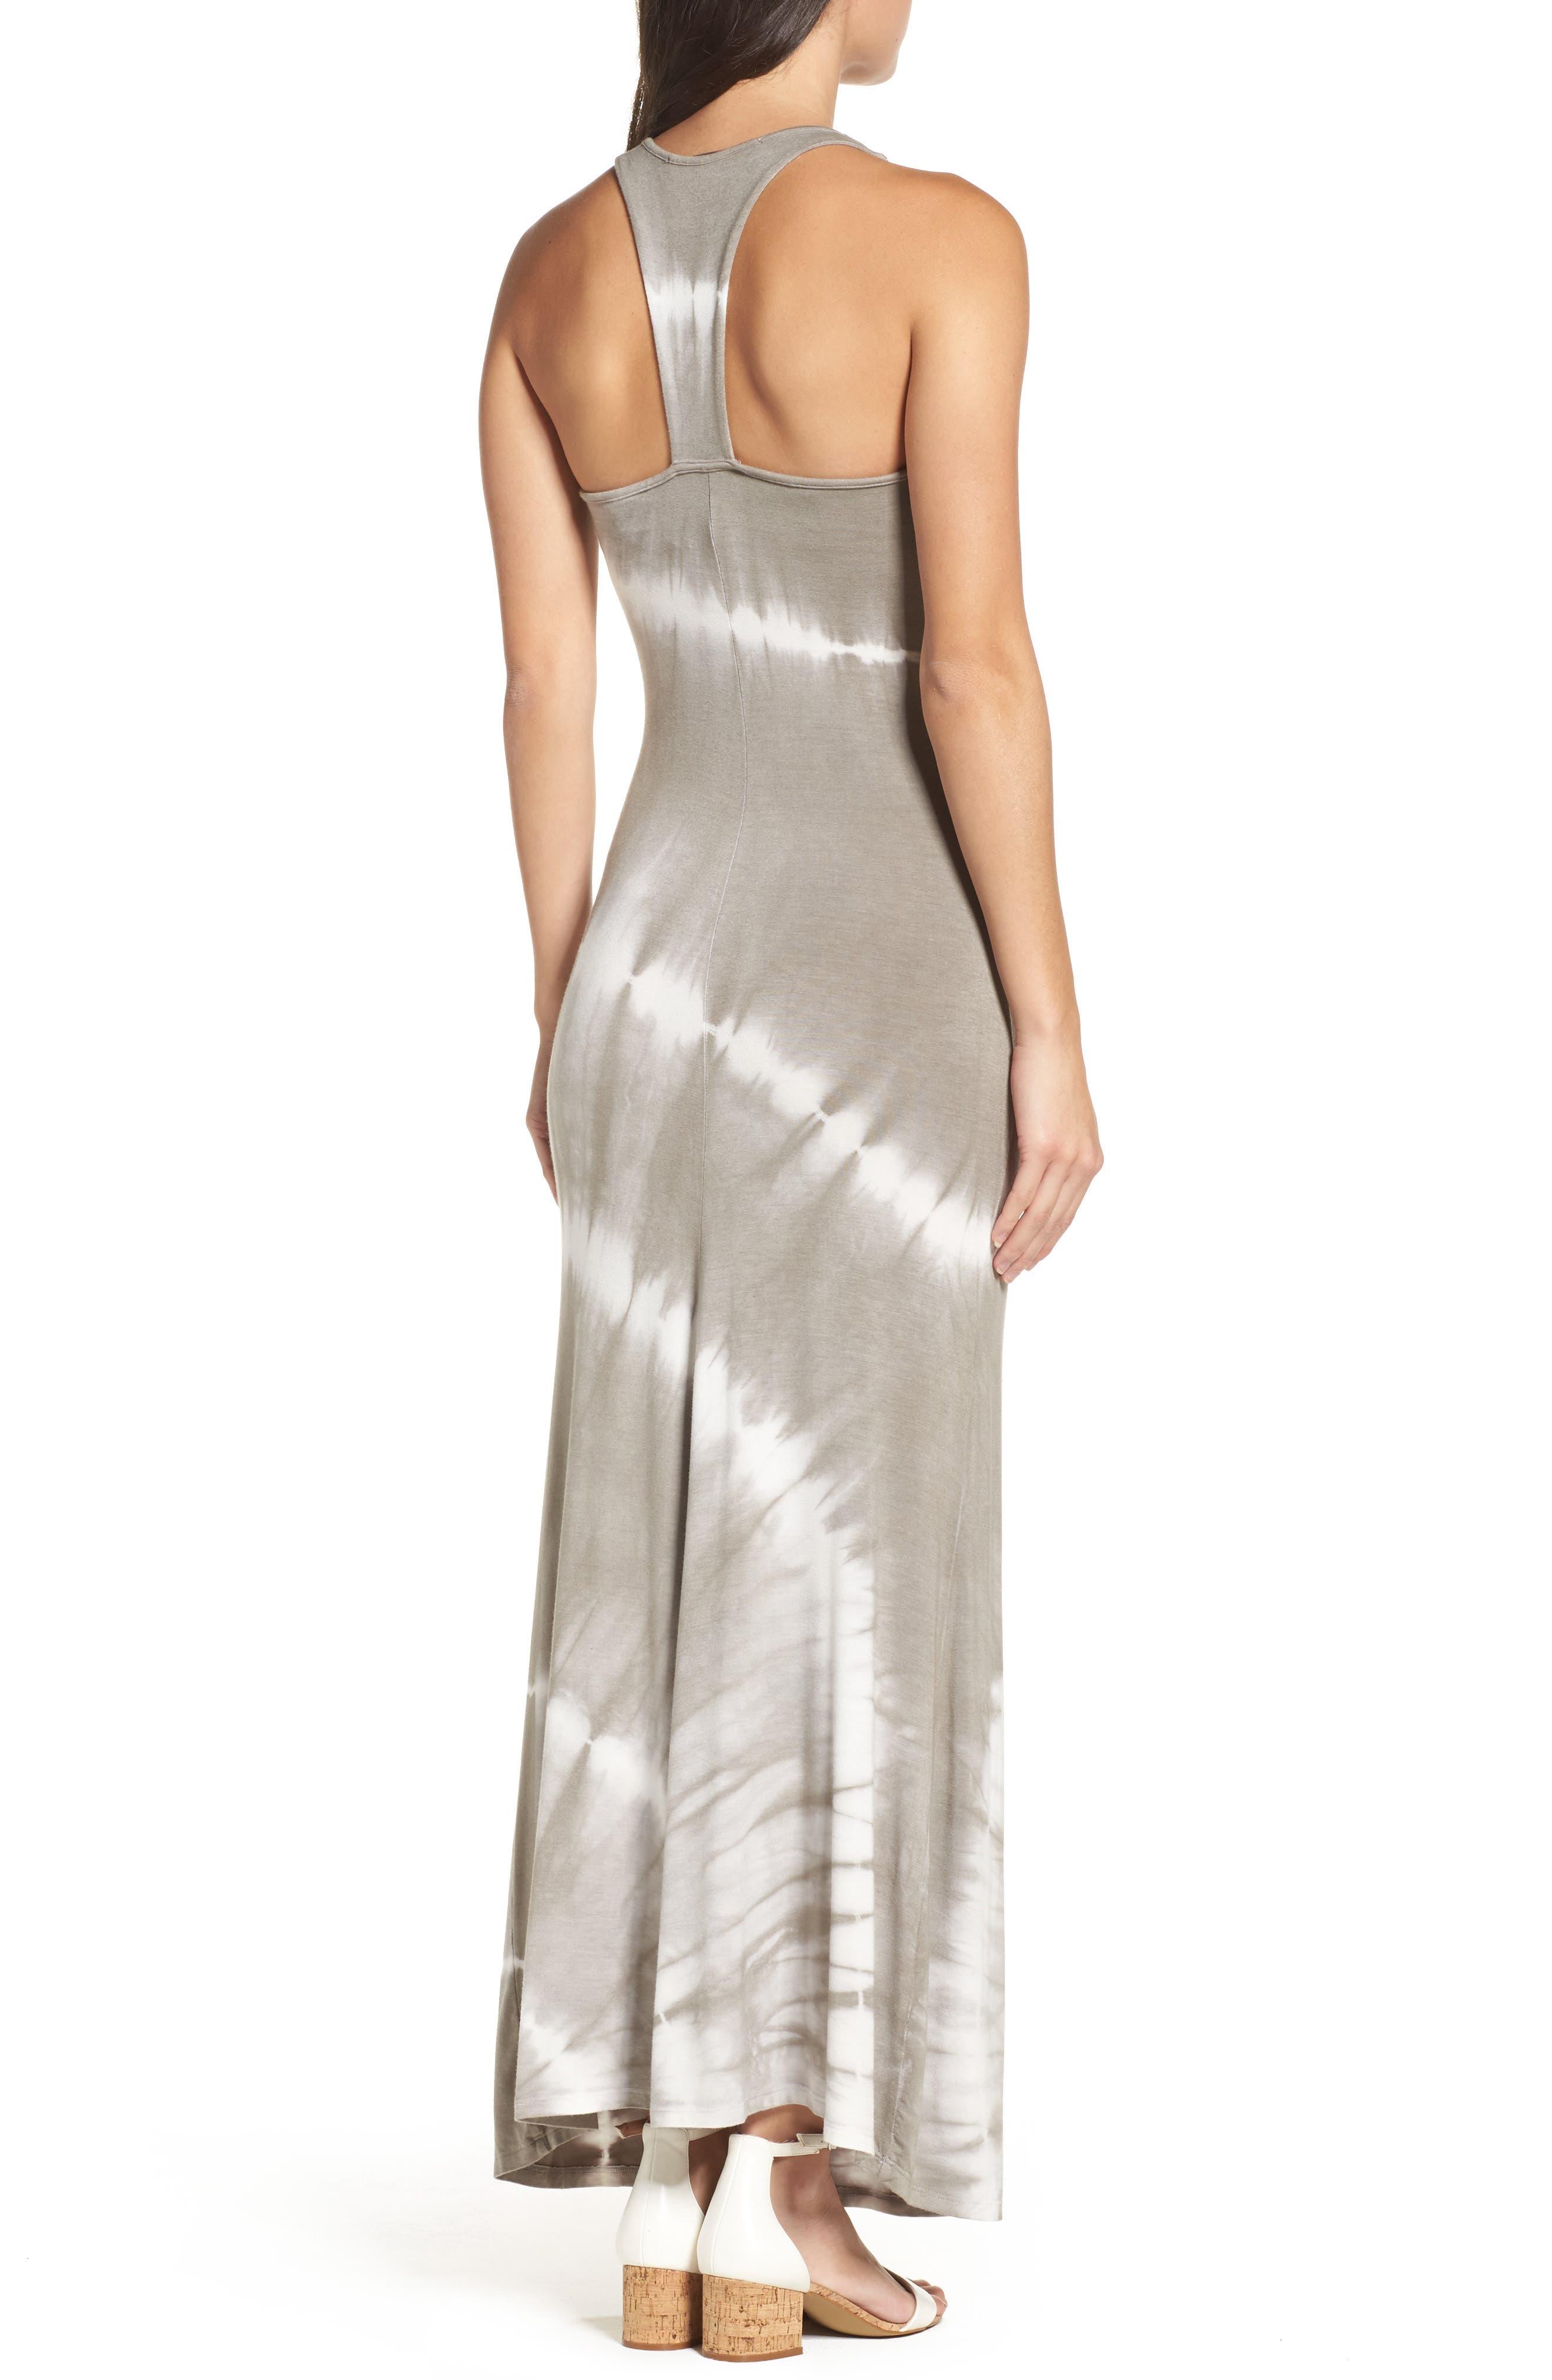 Tie Dye Racerback Maxi Dress,                             Alternate thumbnail 3, color,                             GREY/ WHITE